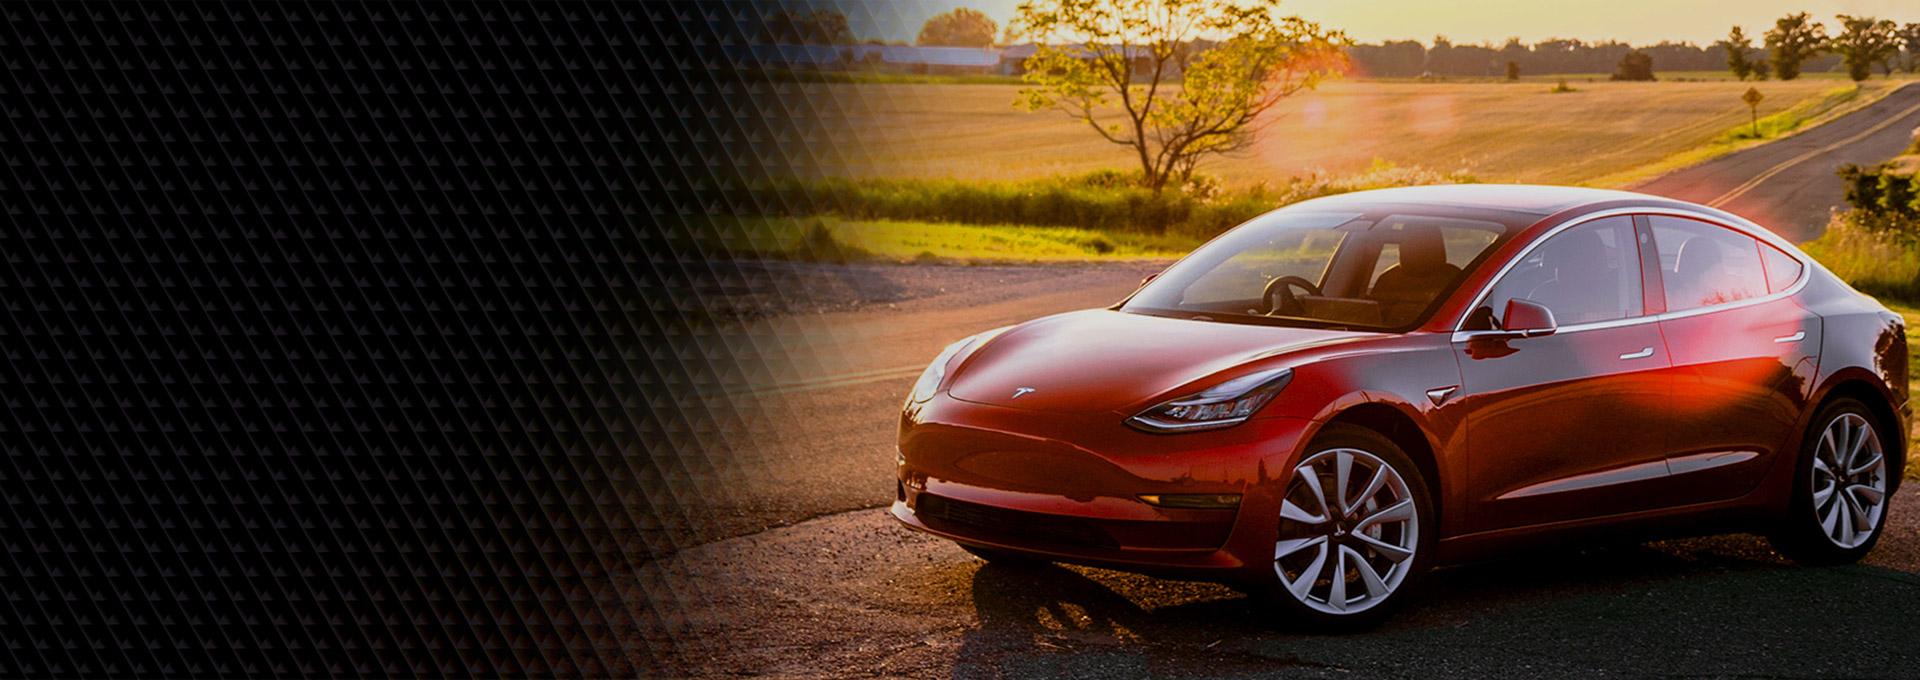 EV & Hybrid